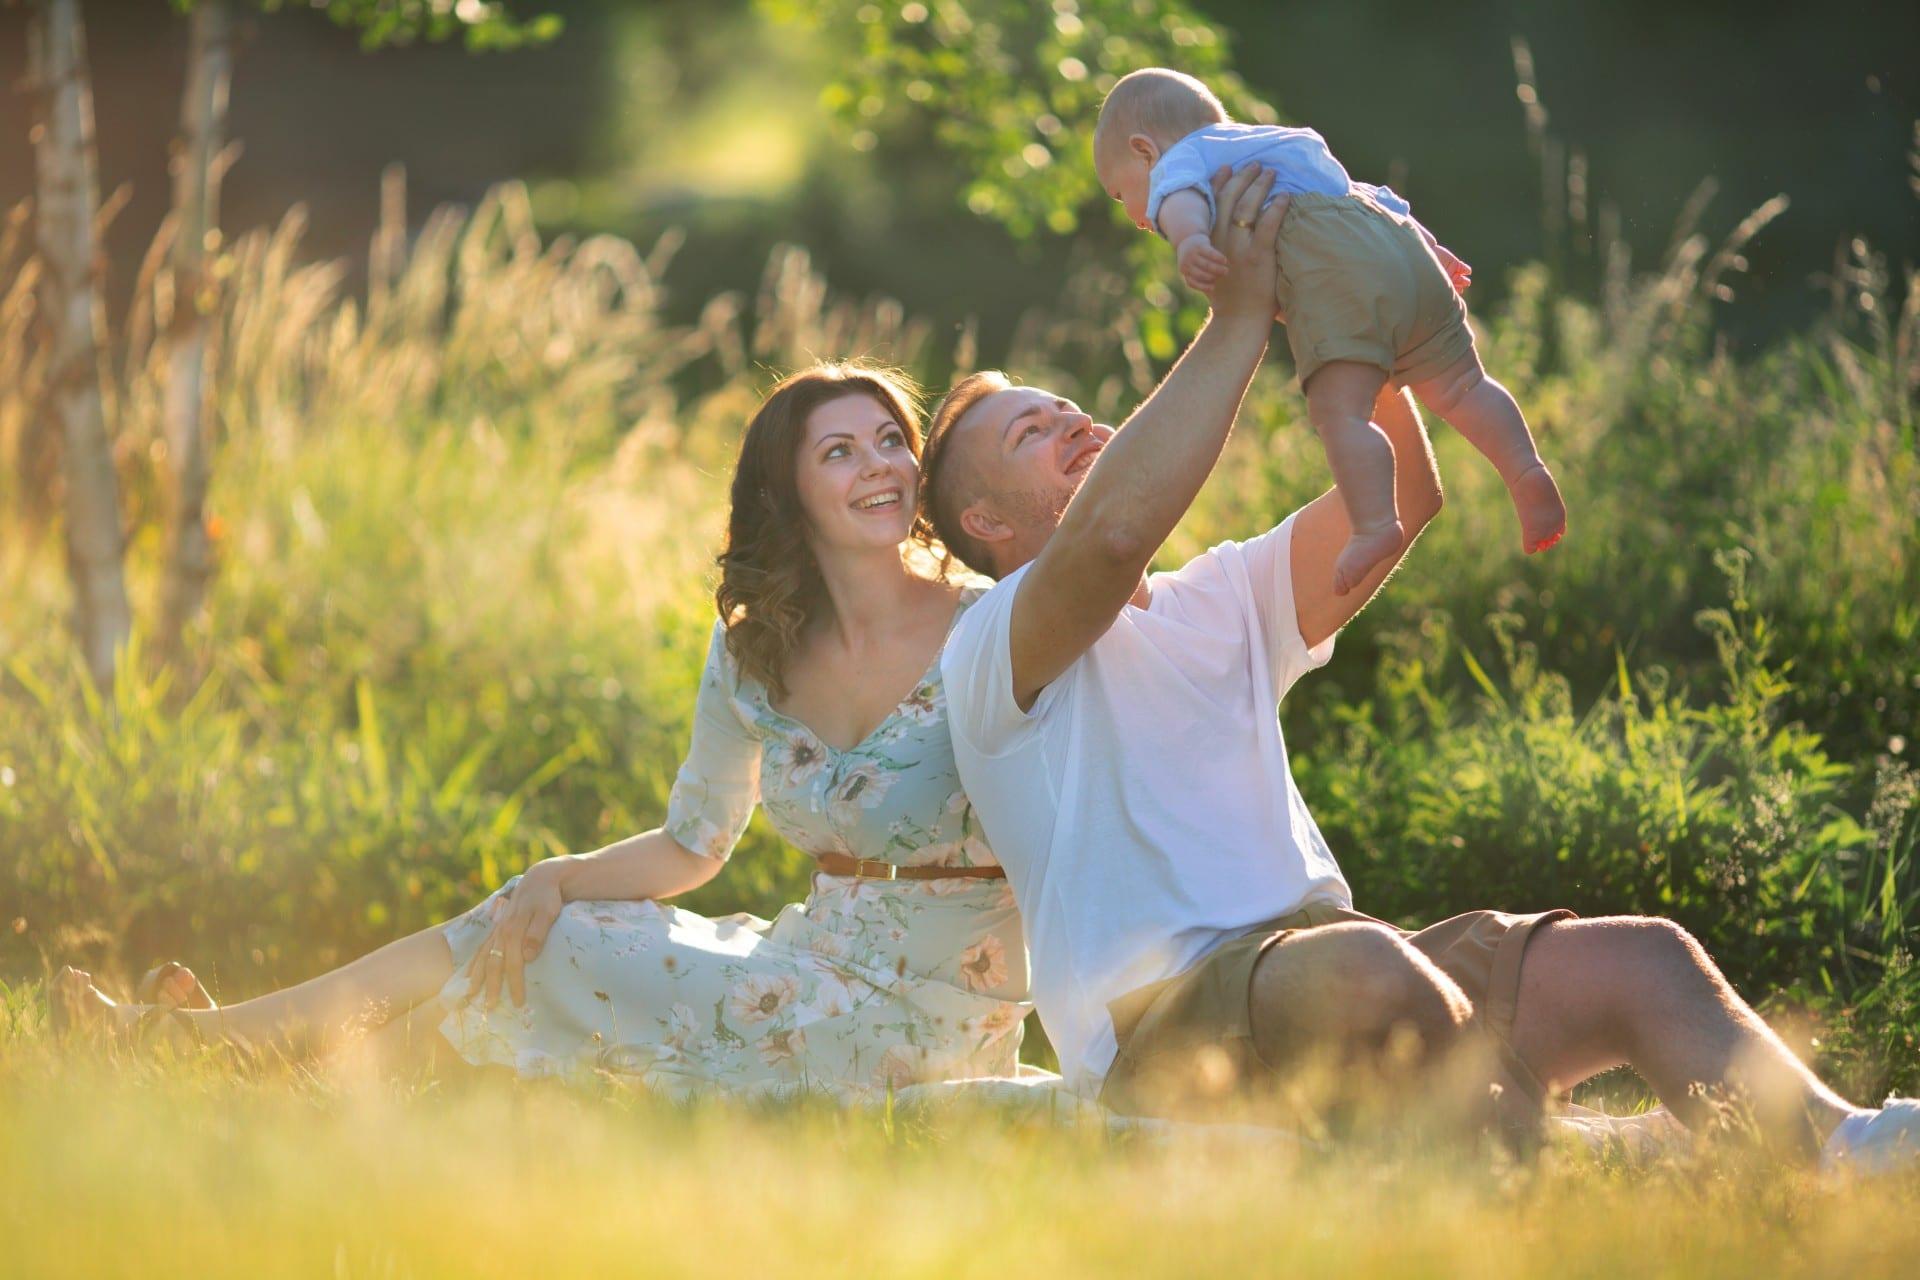 546-Veronika-Hahn-Fotografie-Familienfotos-MZAPTSCp (1)